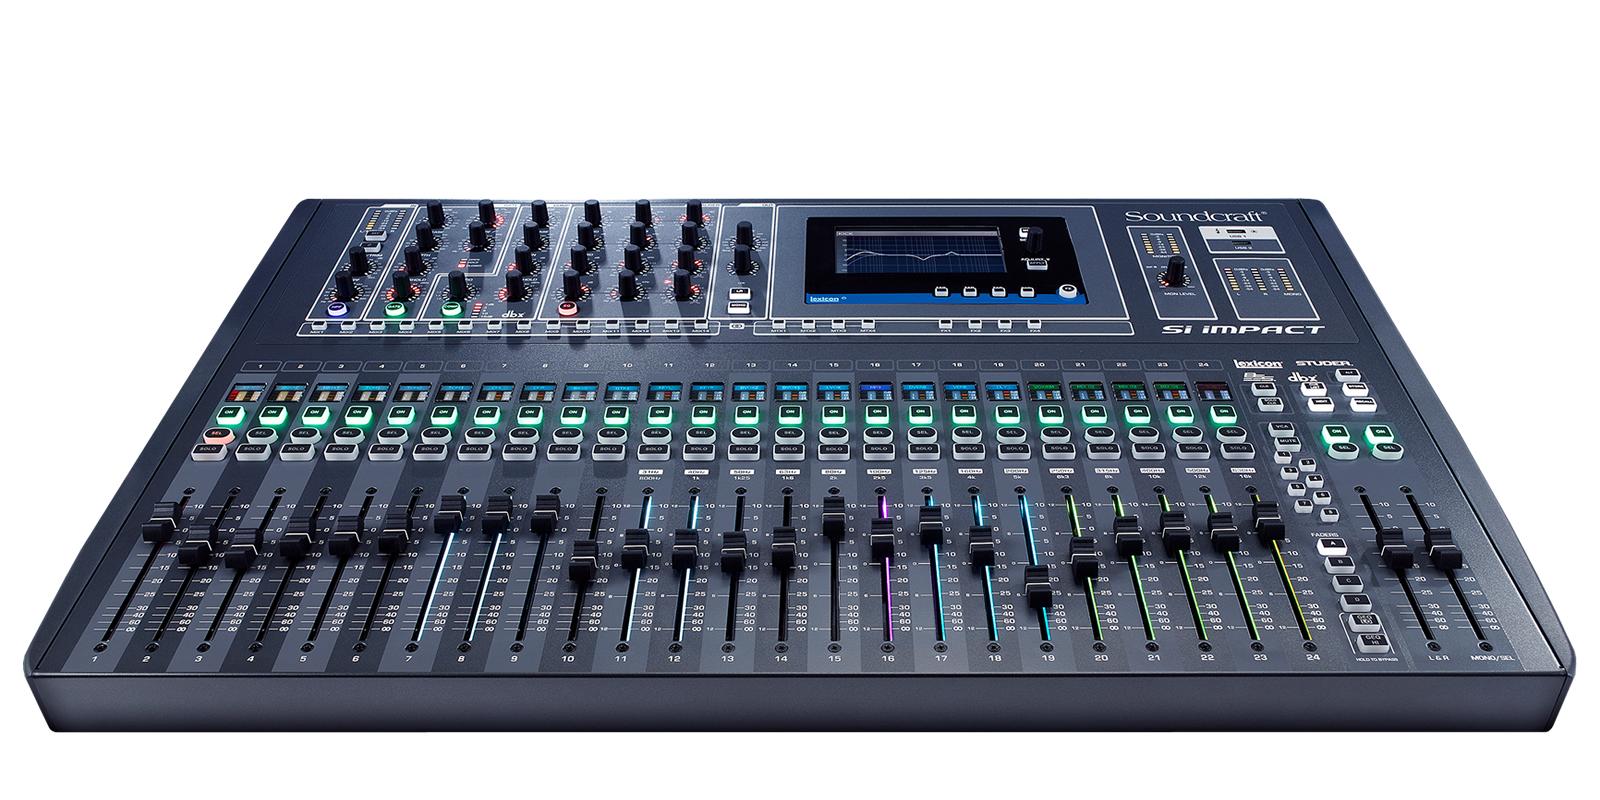 si impact soundcraft professional audio mixers. Black Bedroom Furniture Sets. Home Design Ideas